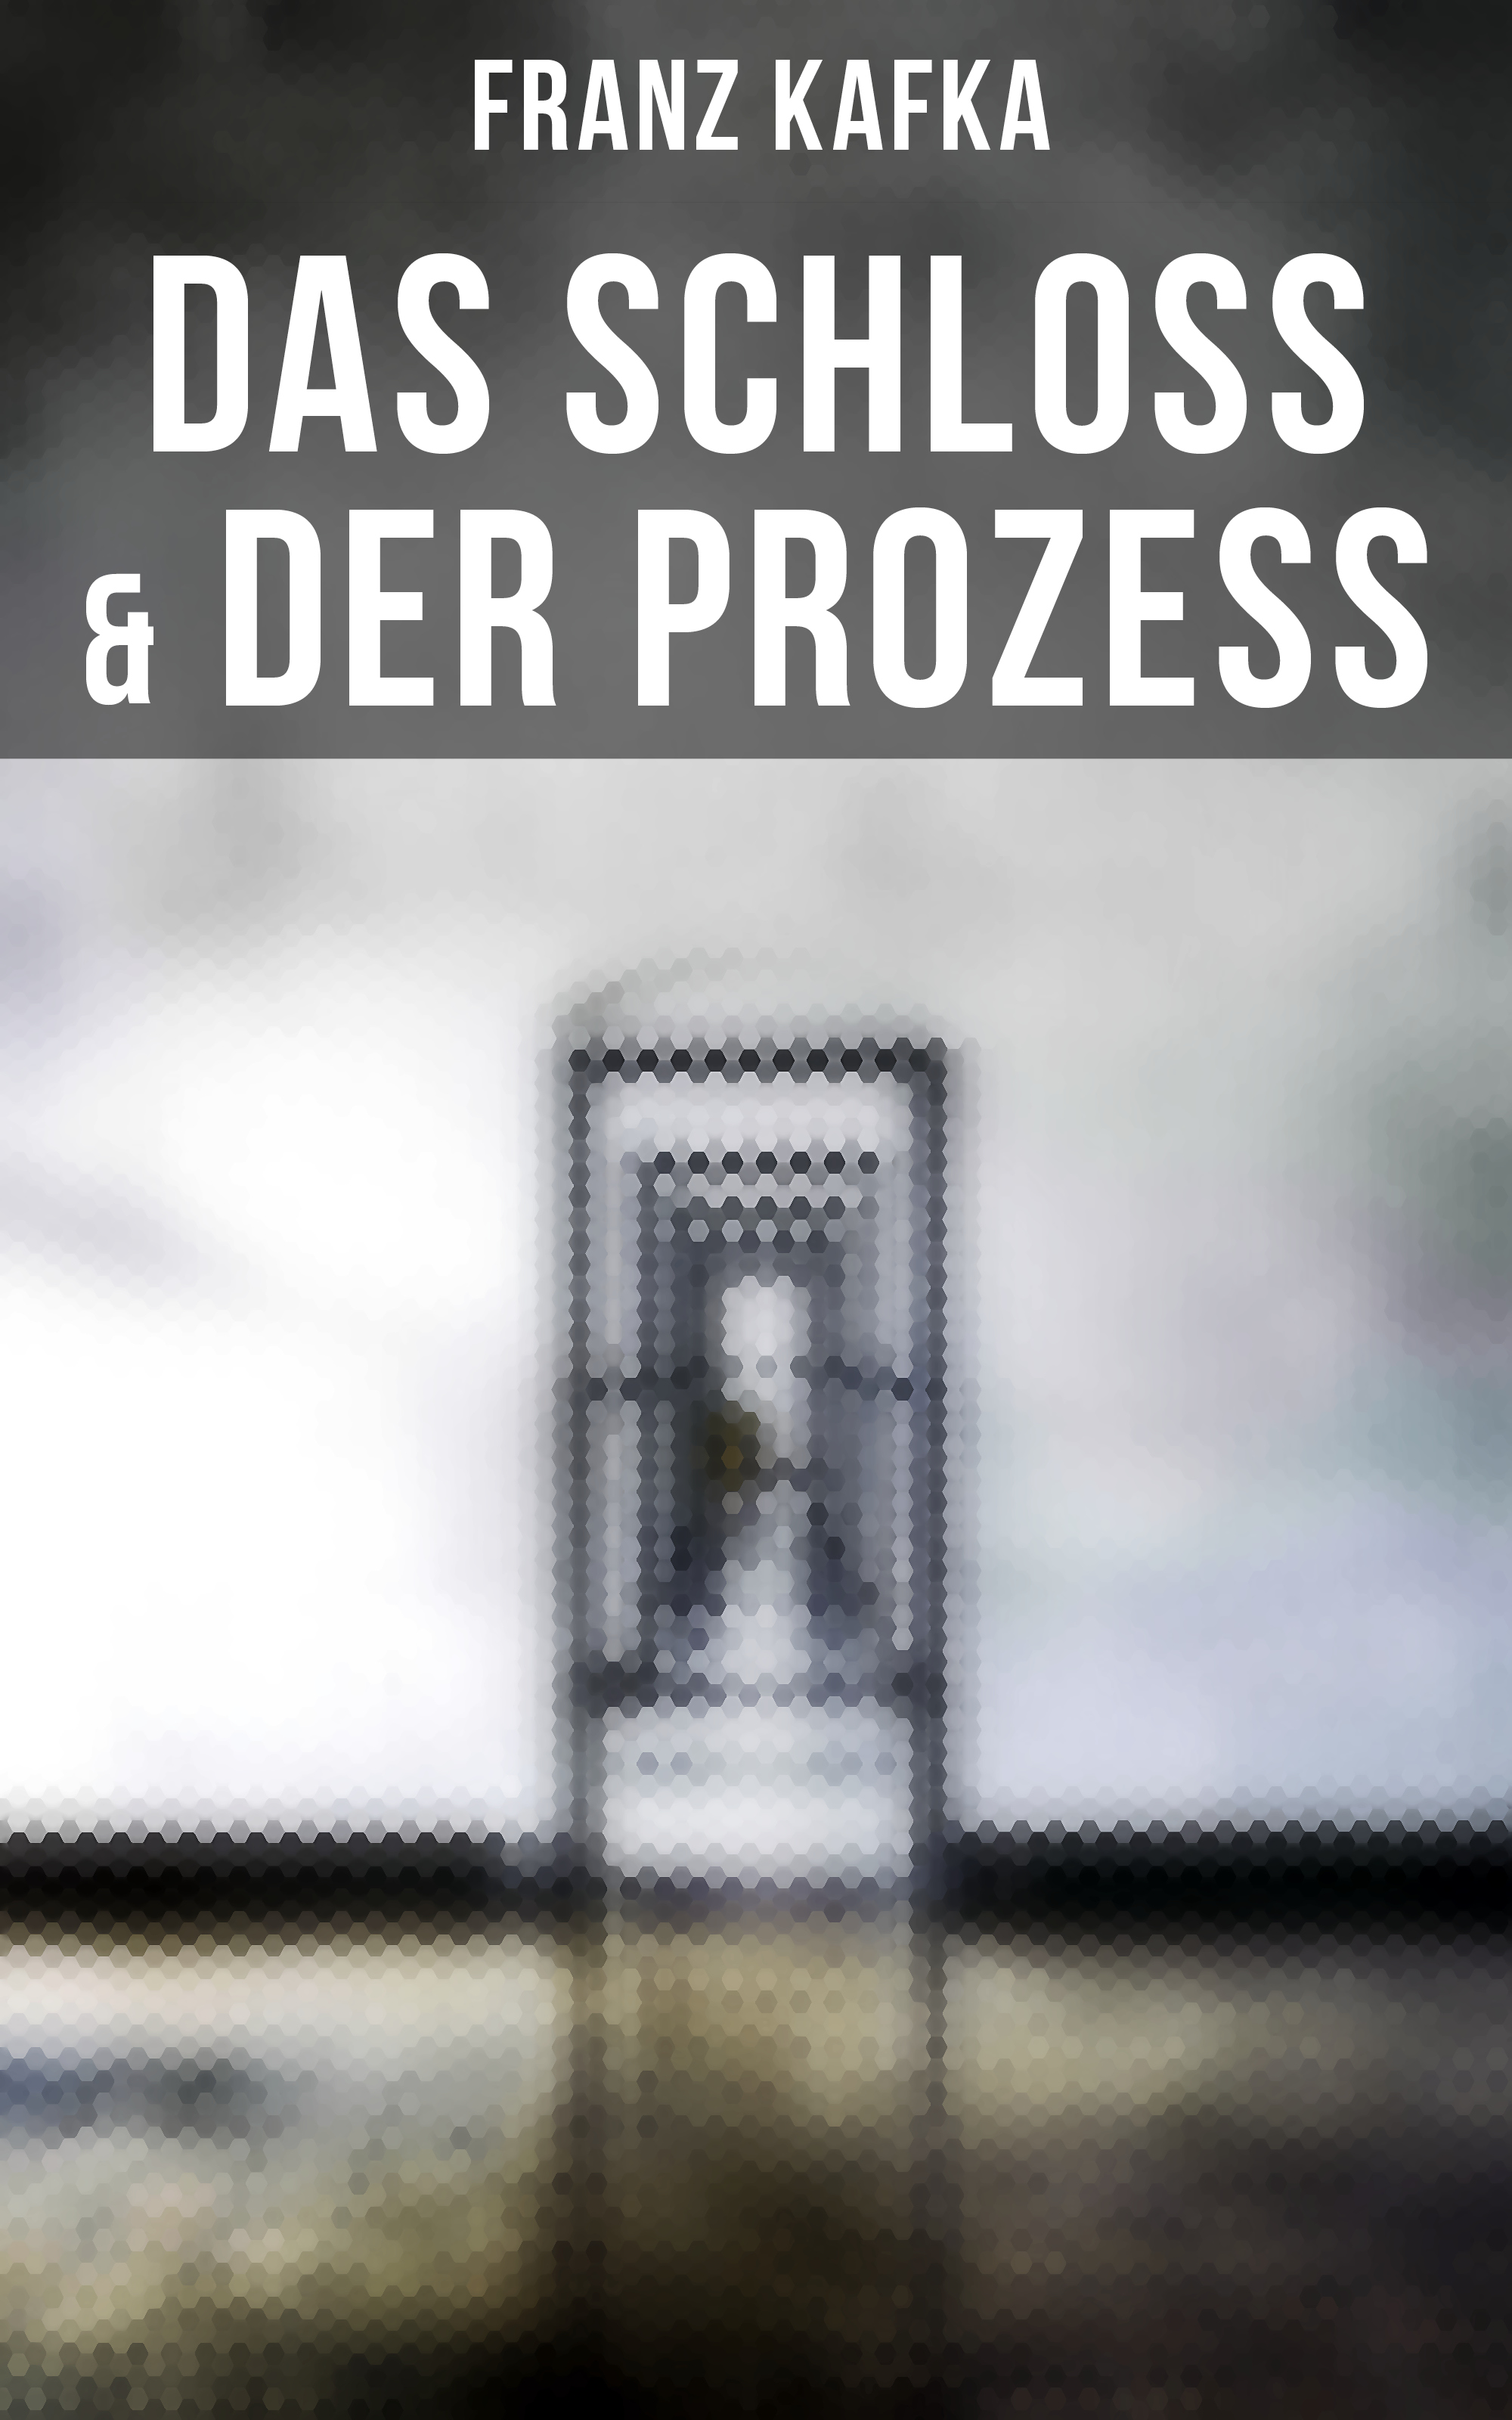 лучшая цена Франц Кафка Das Schloss & Der Prozess